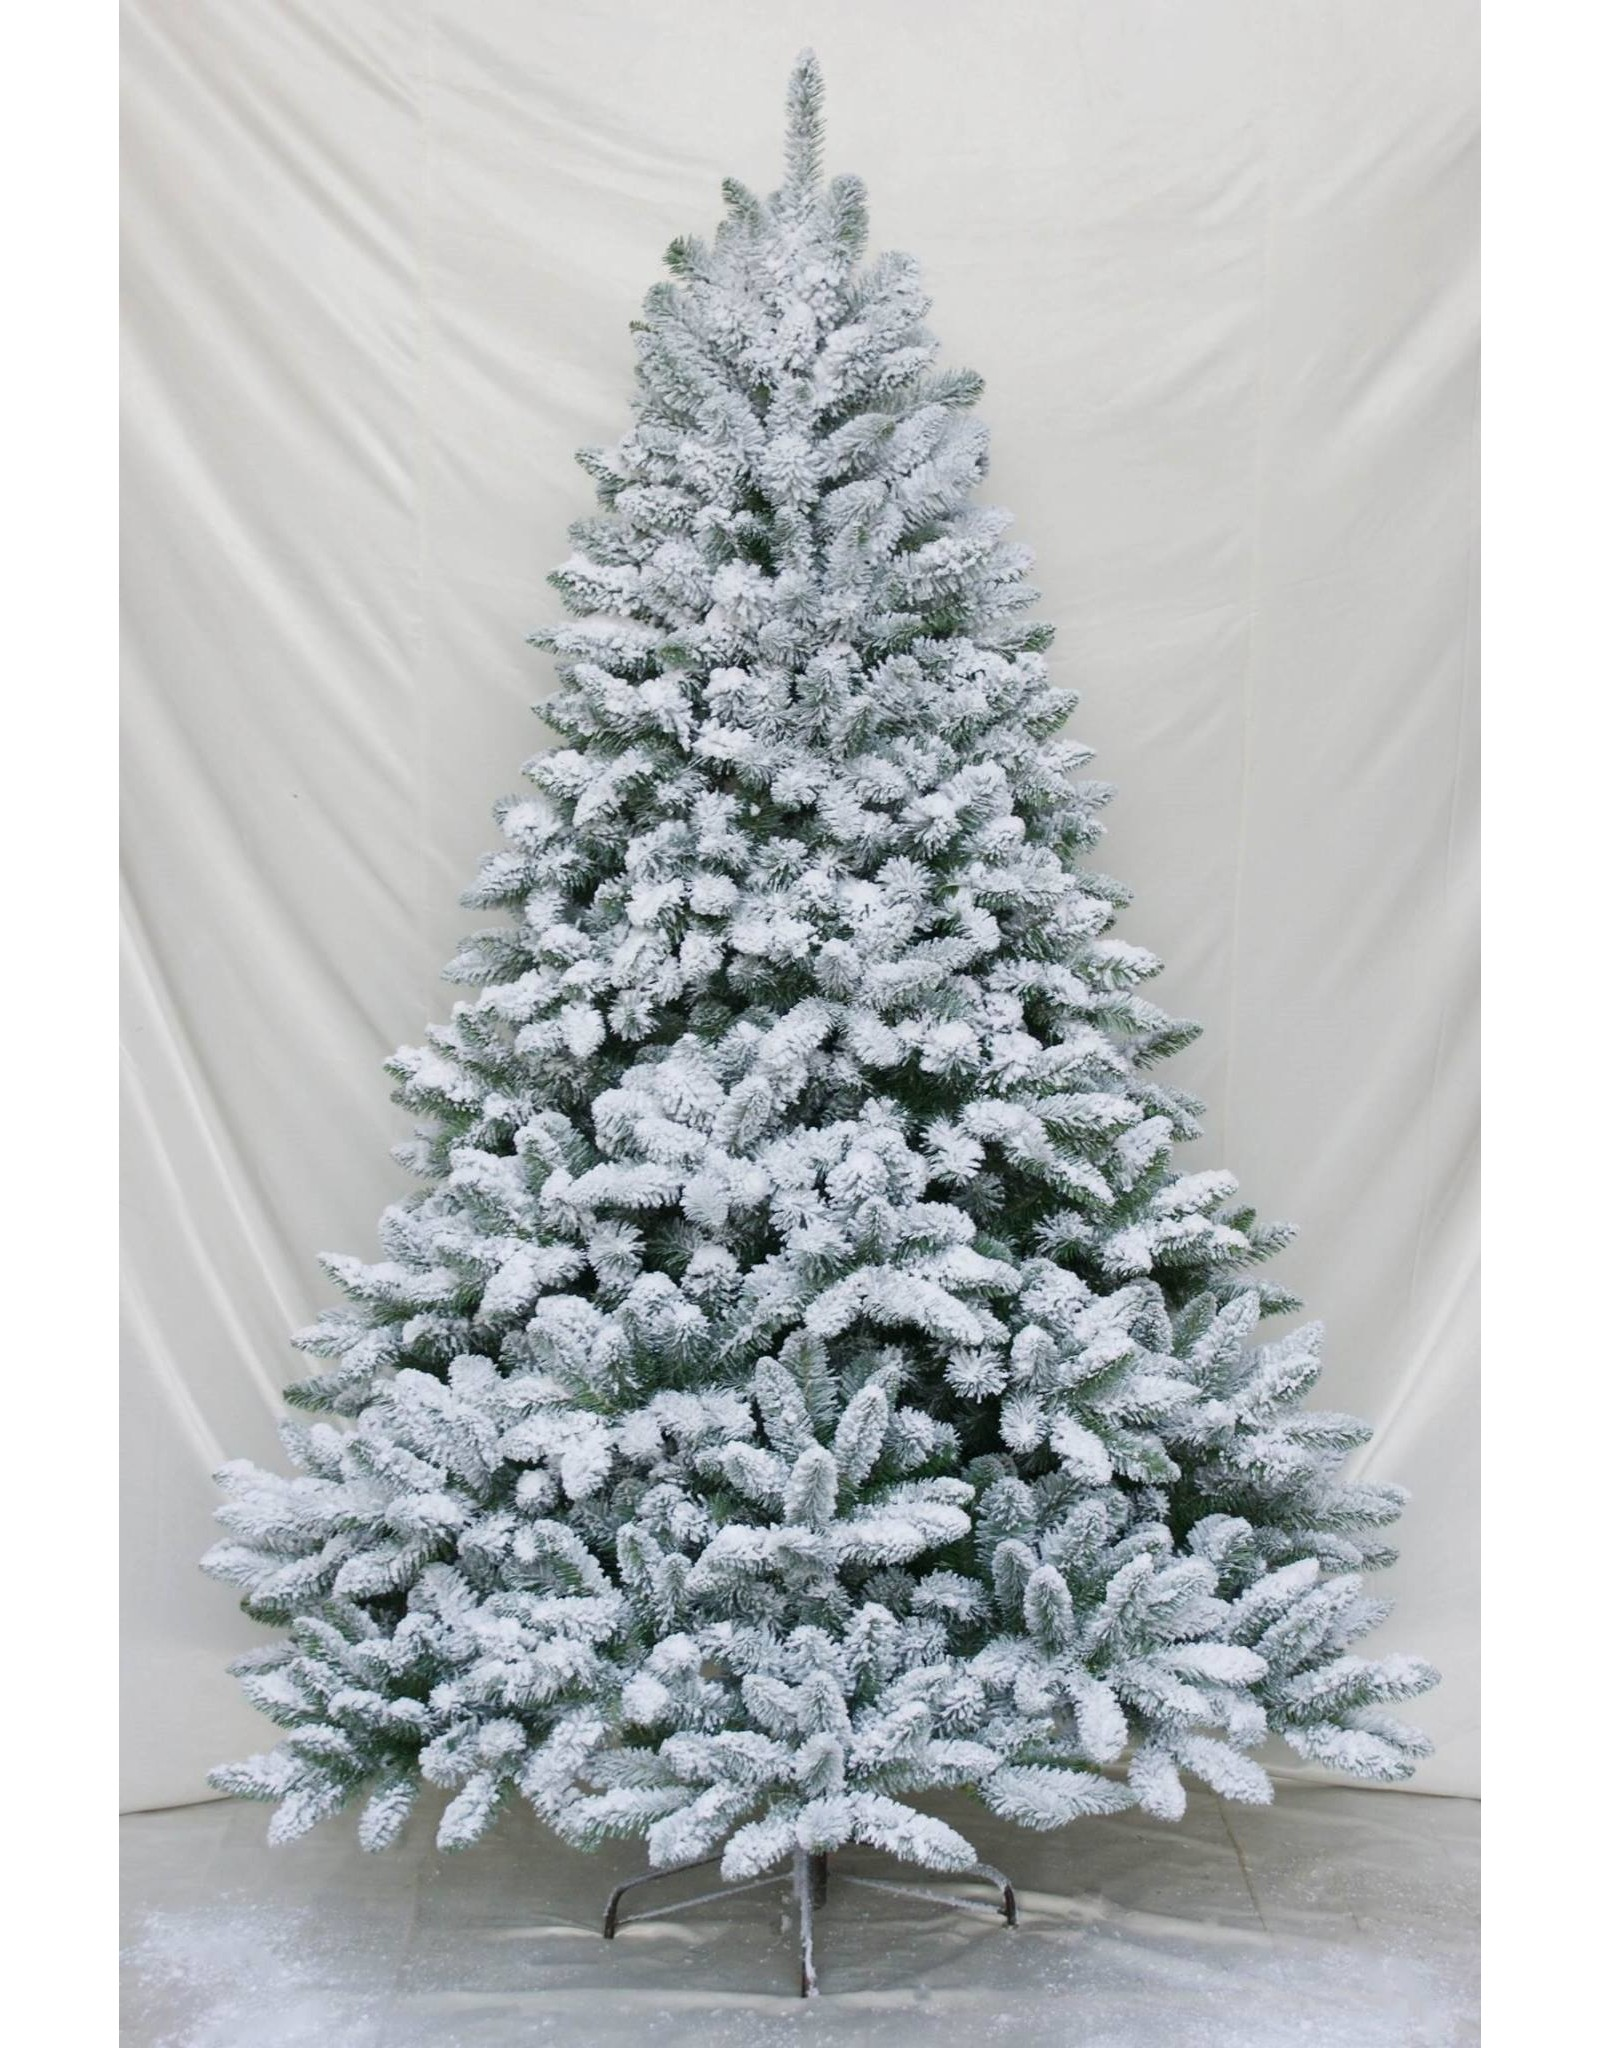 Christmas Tree (Nevado) w/Snow 7 ft CF413421